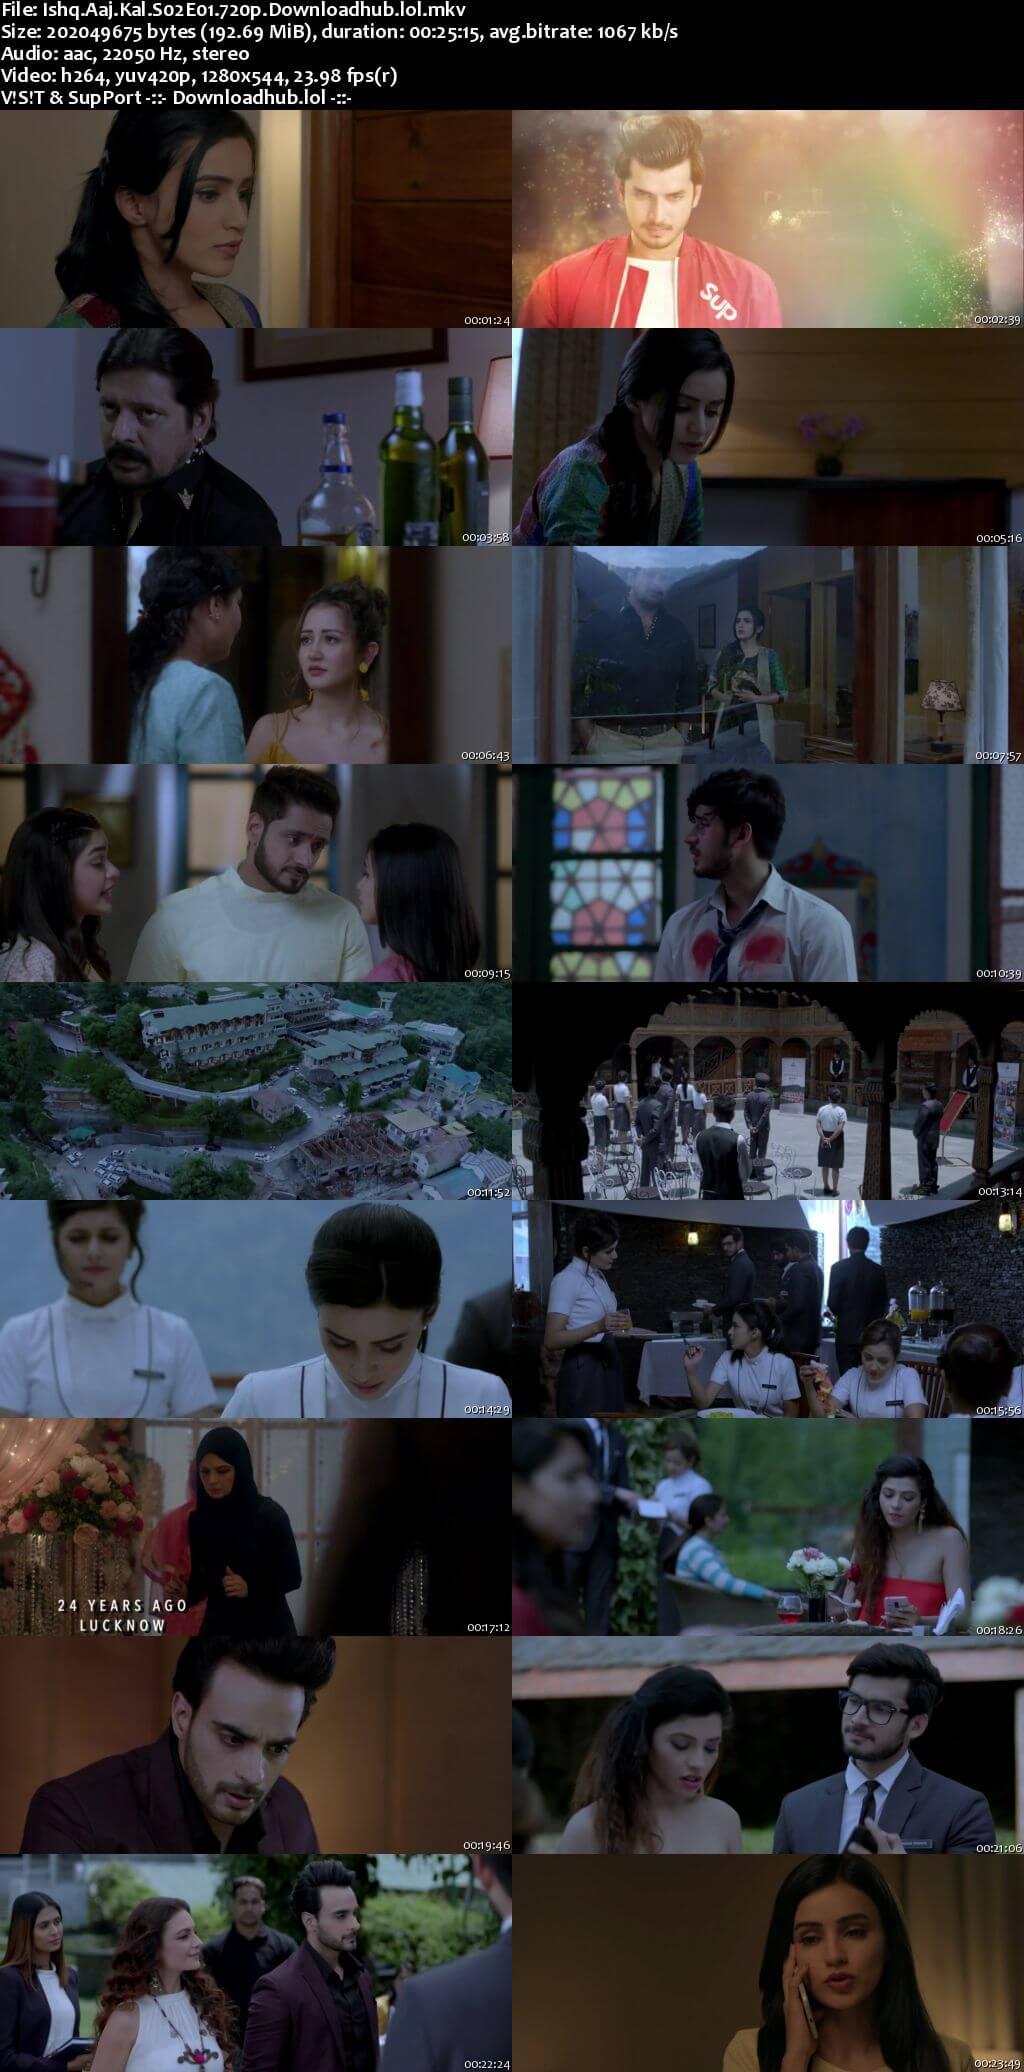 Ishq Aaj Kal 2019 Hindi Season 02 Complete 720p HDRip x264